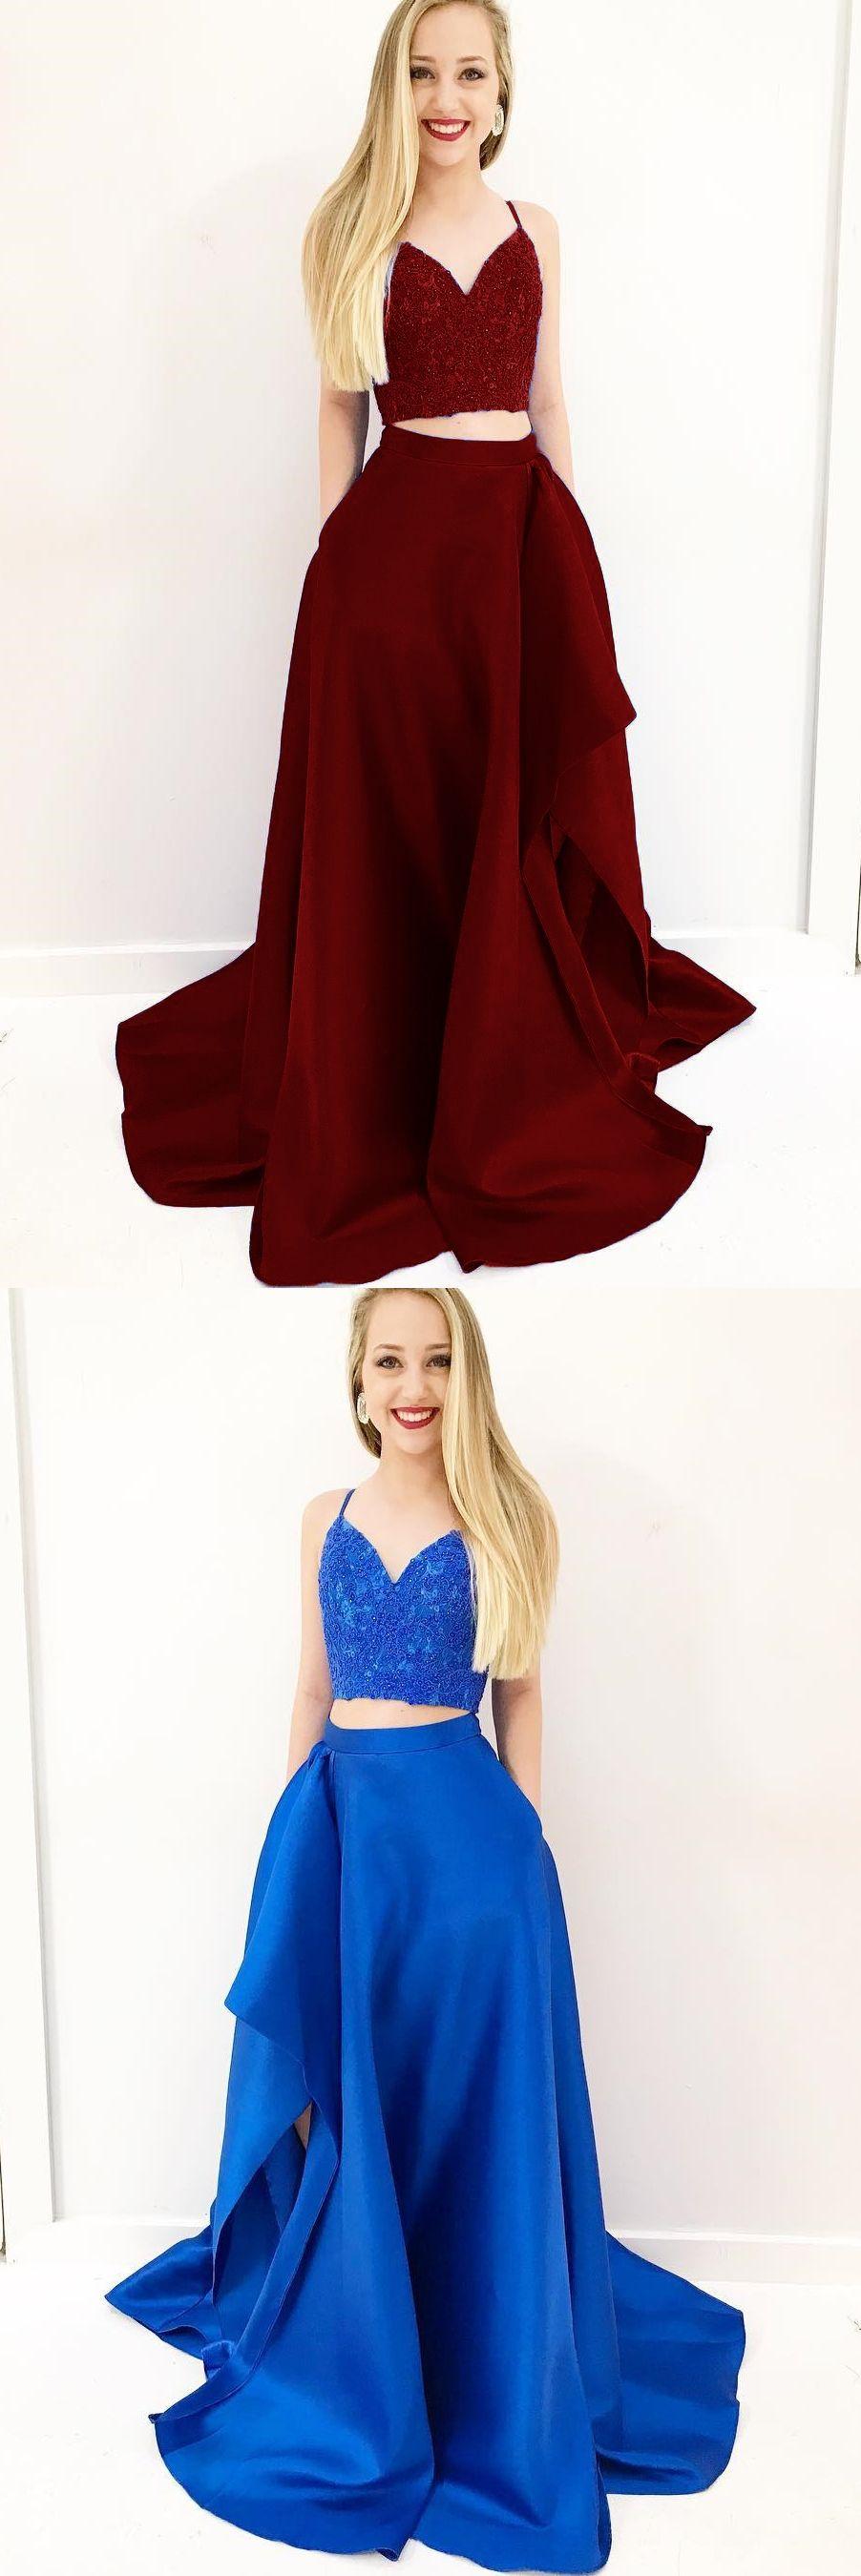 Two piece spaghetti straps royal blue prom dress with pockets split